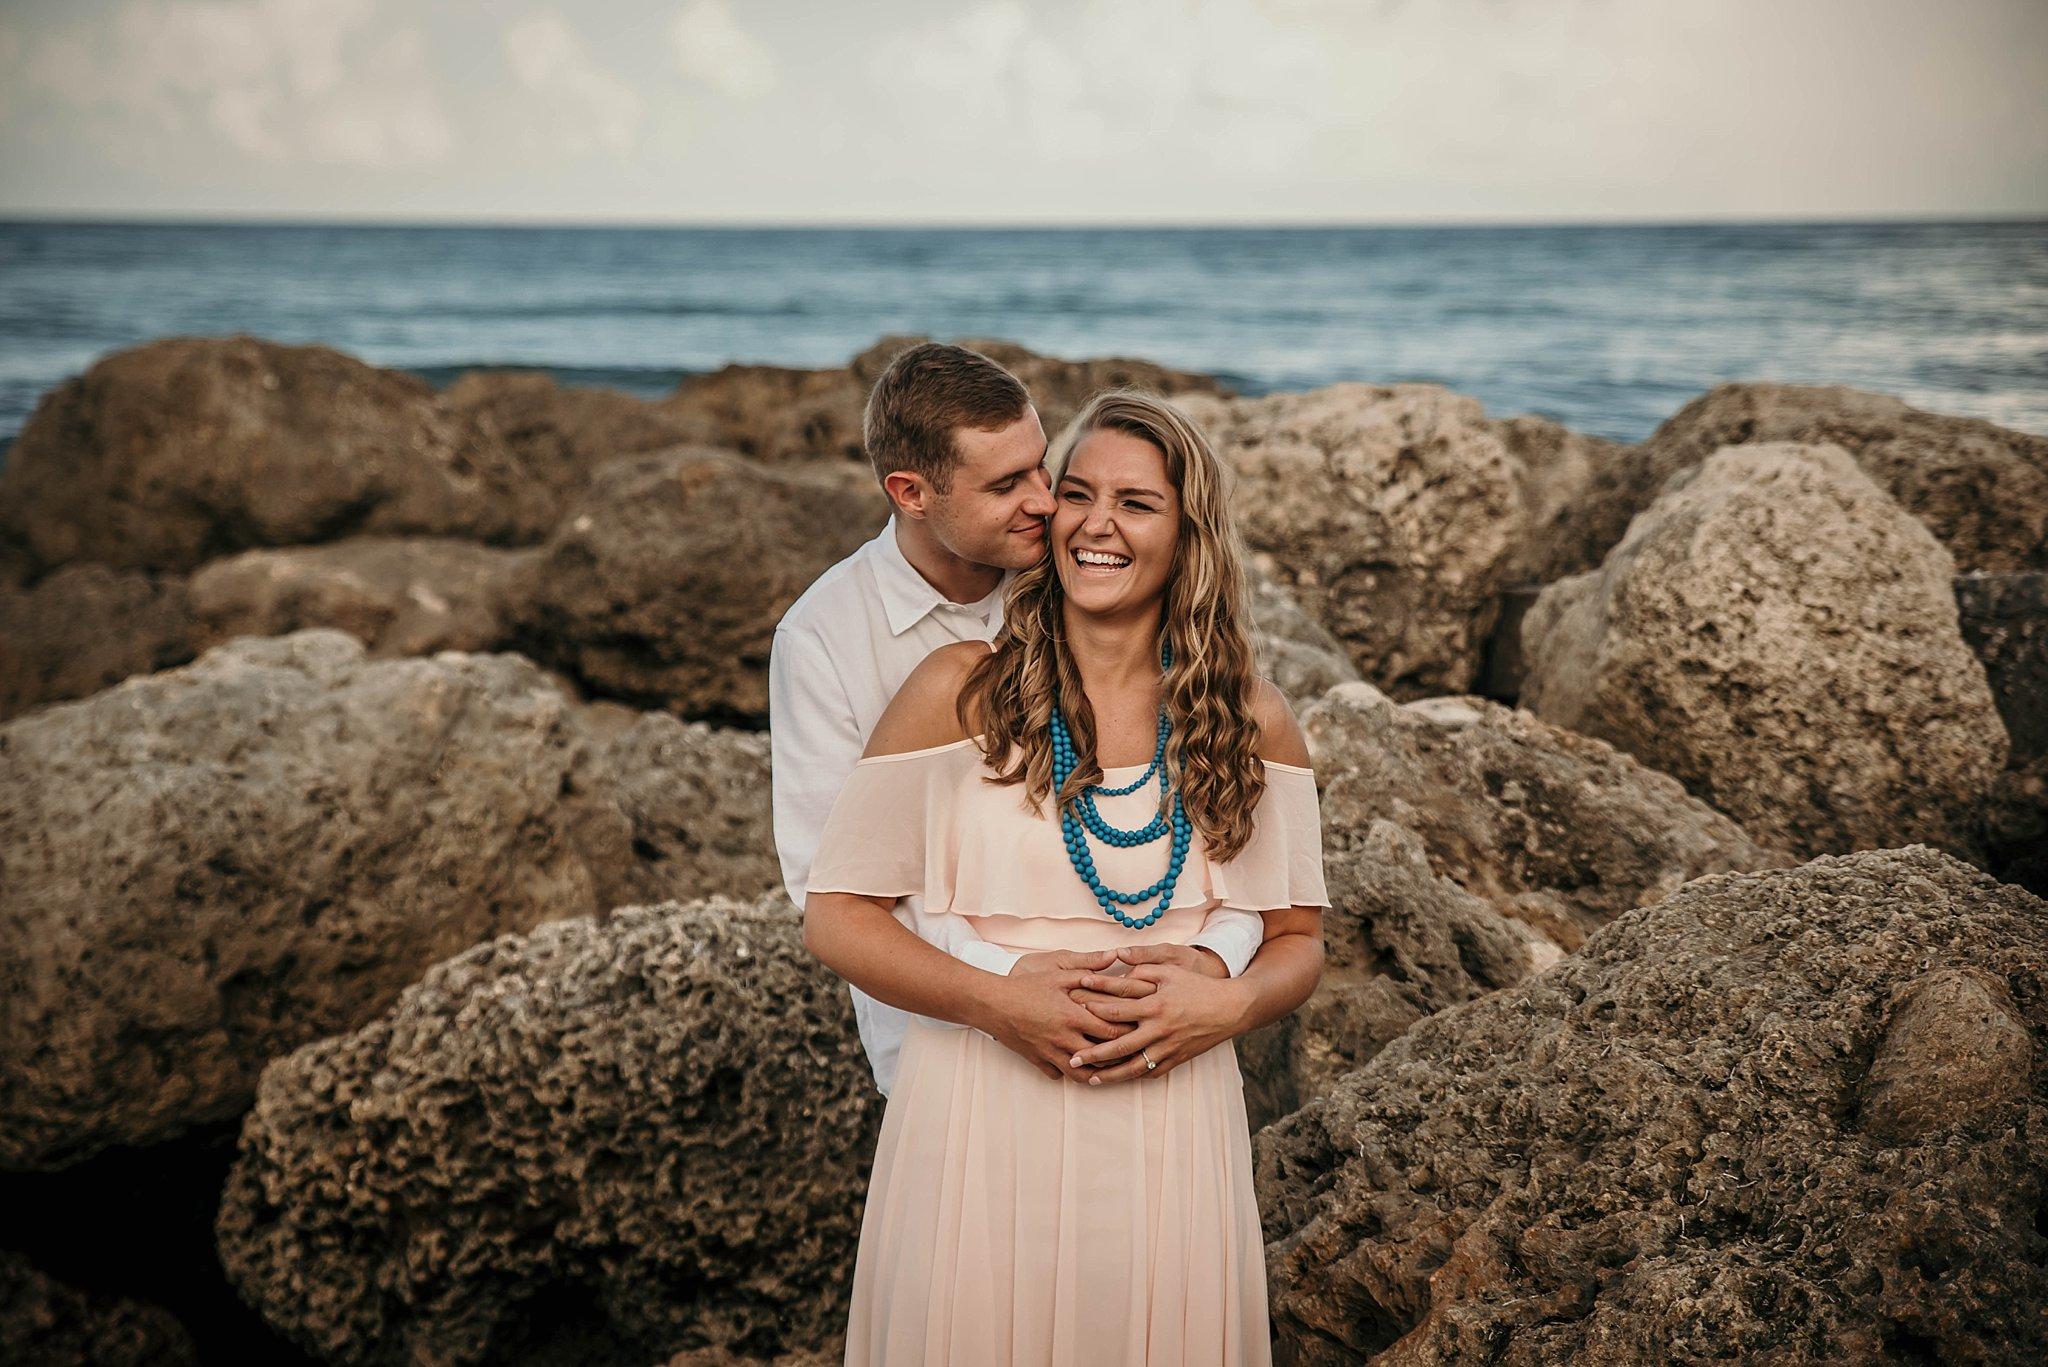 palm-beach-engagement-photos-florida-wedding-photographer_0012.jpg